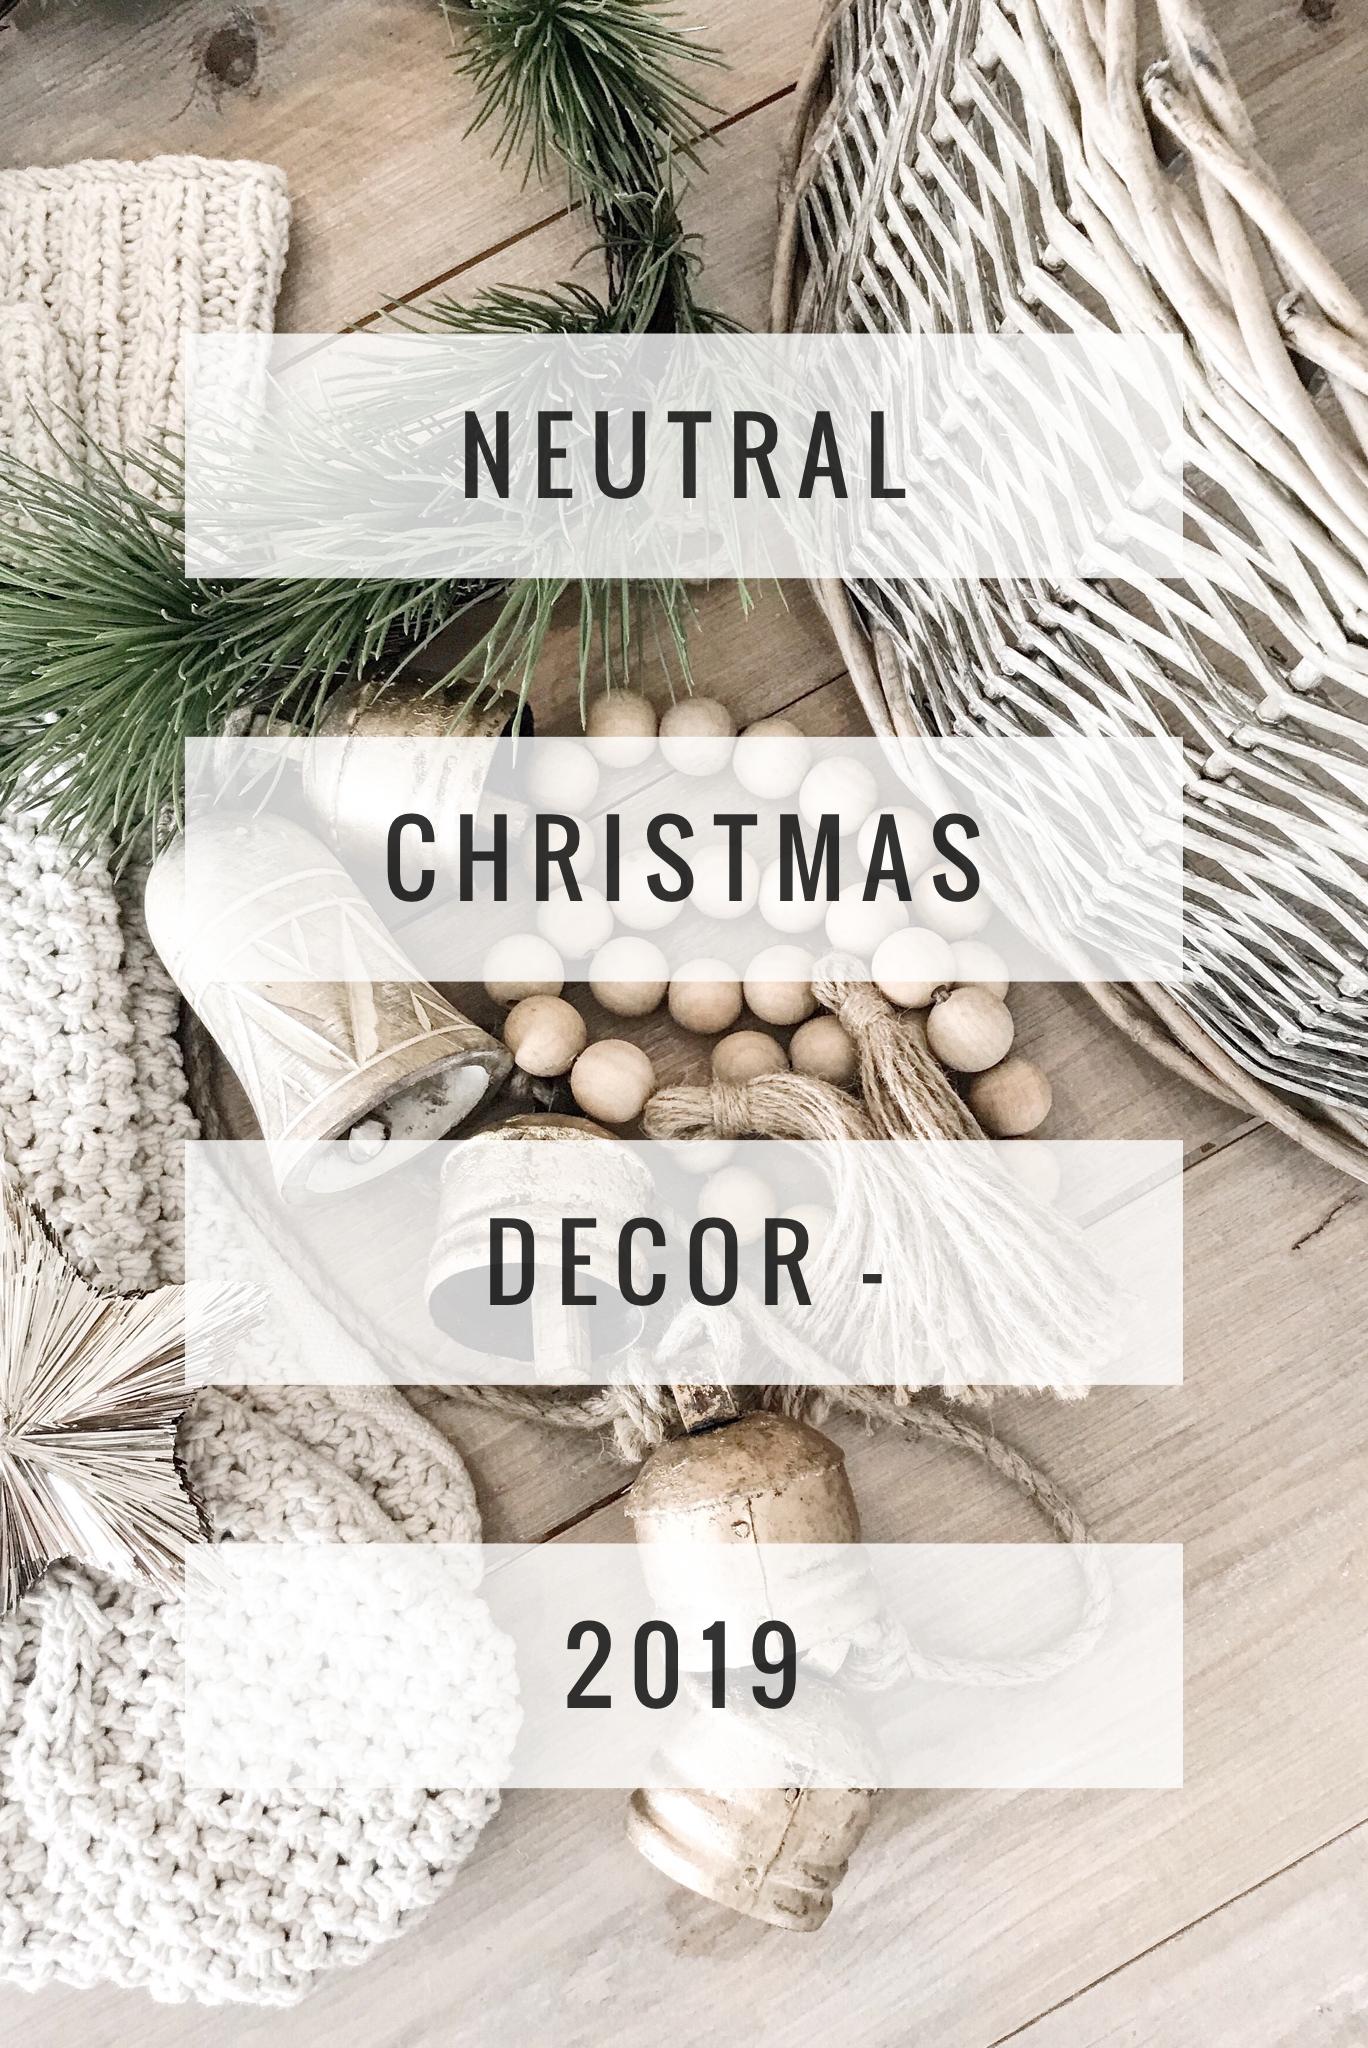 Neutral Christmas Decor 2019 Neutral Christmas Decor Affordable Christmas Decorations Christmas Decorations